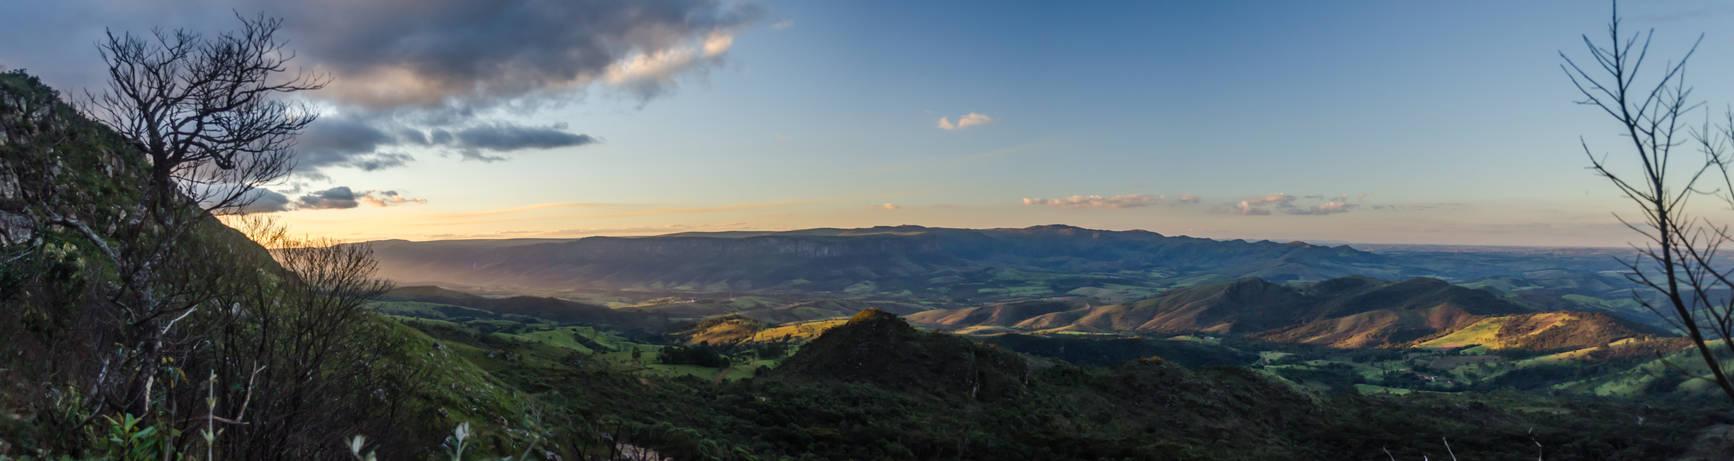 Serra da Canastra - Panorama